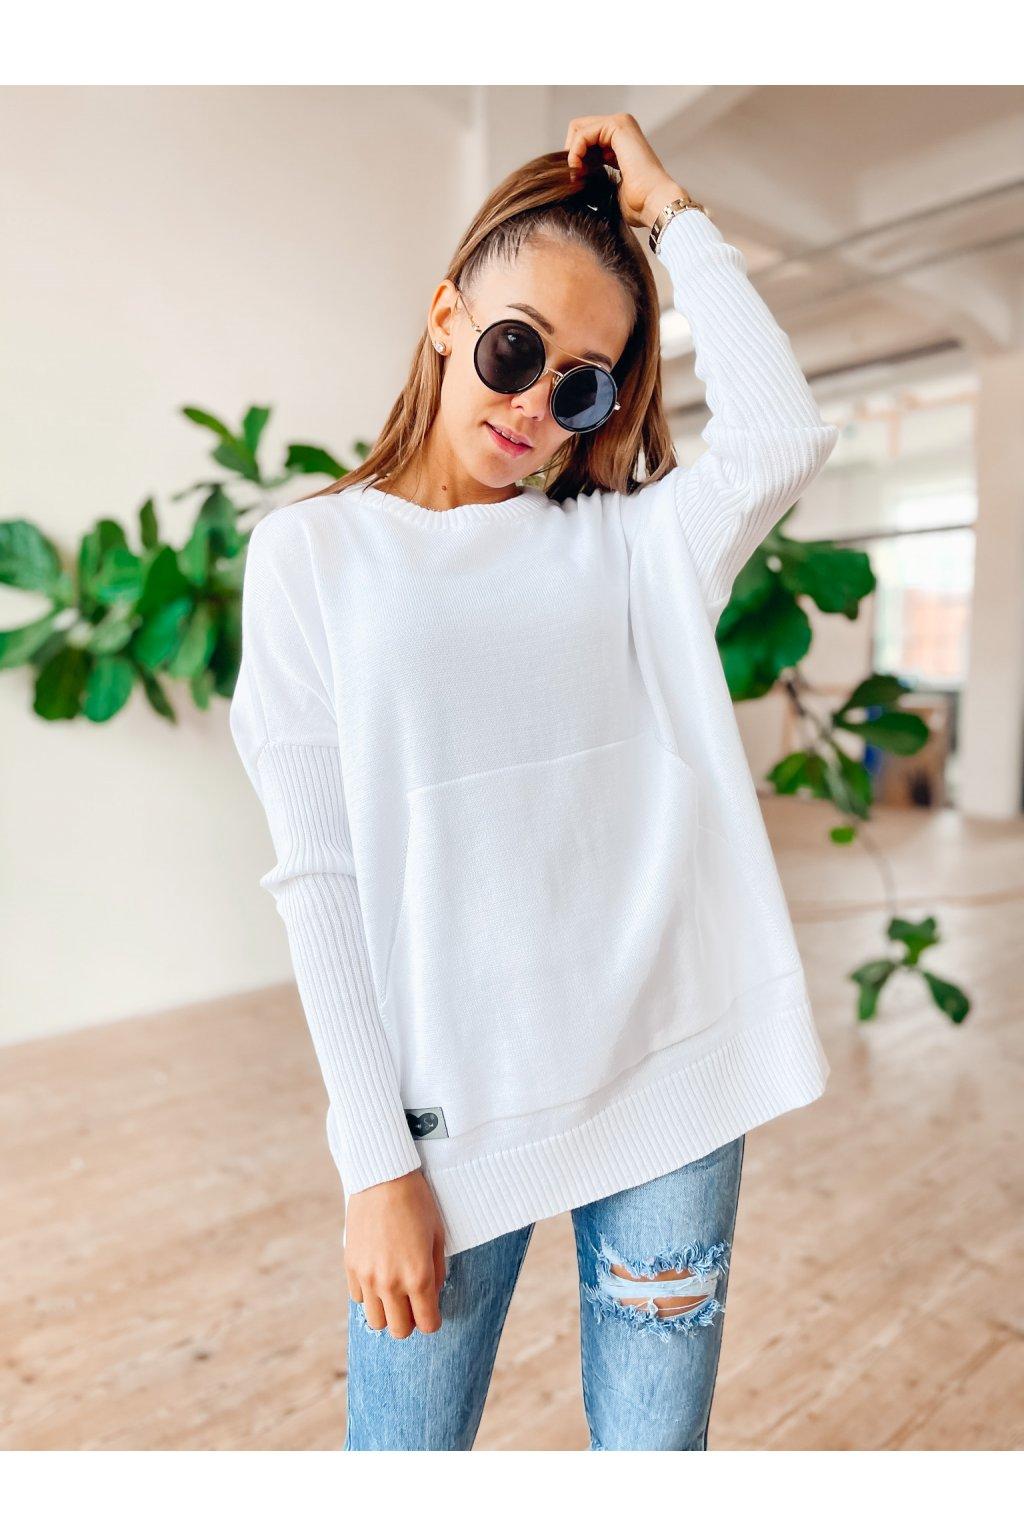 damsky svetr s kapsou spring white eshopat cz 1